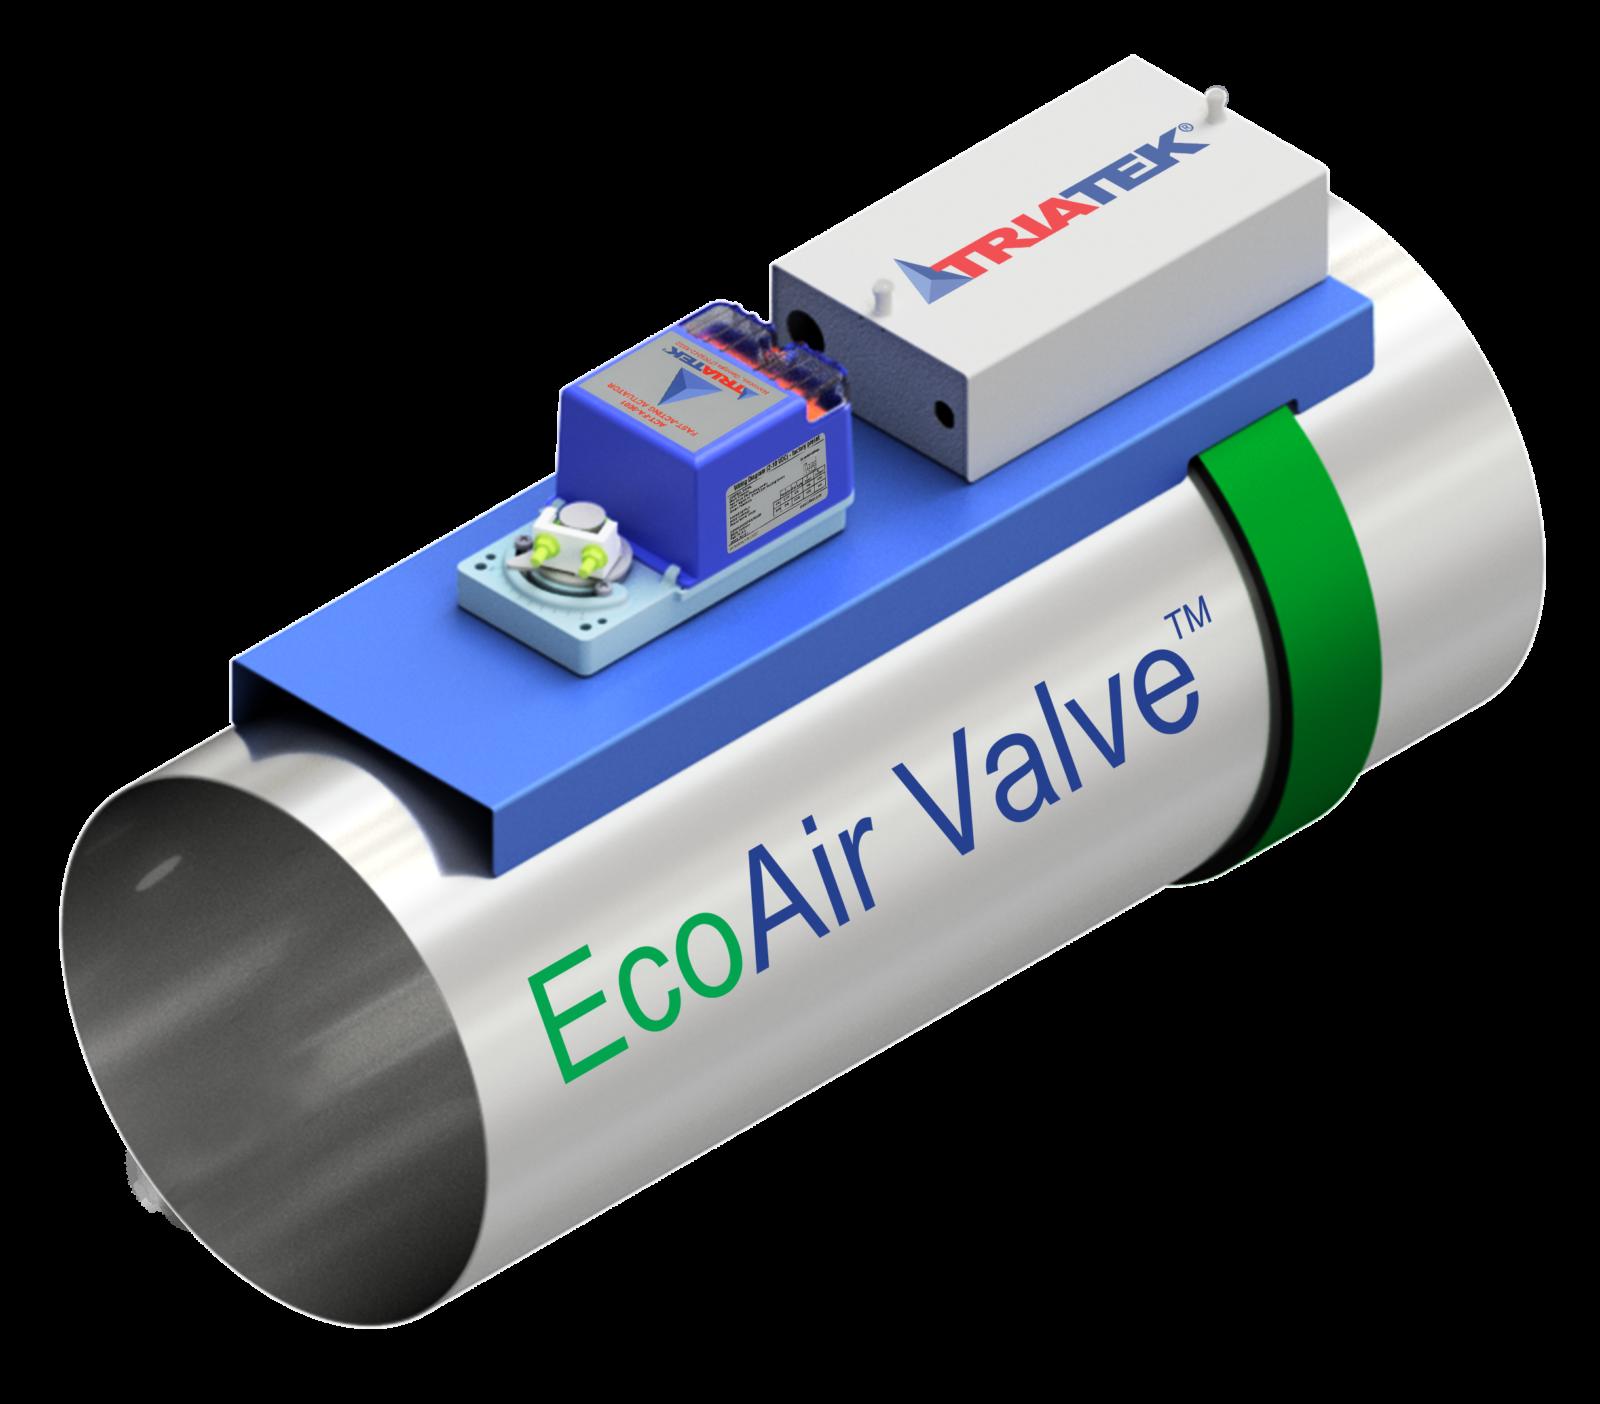 EcoAir Valve